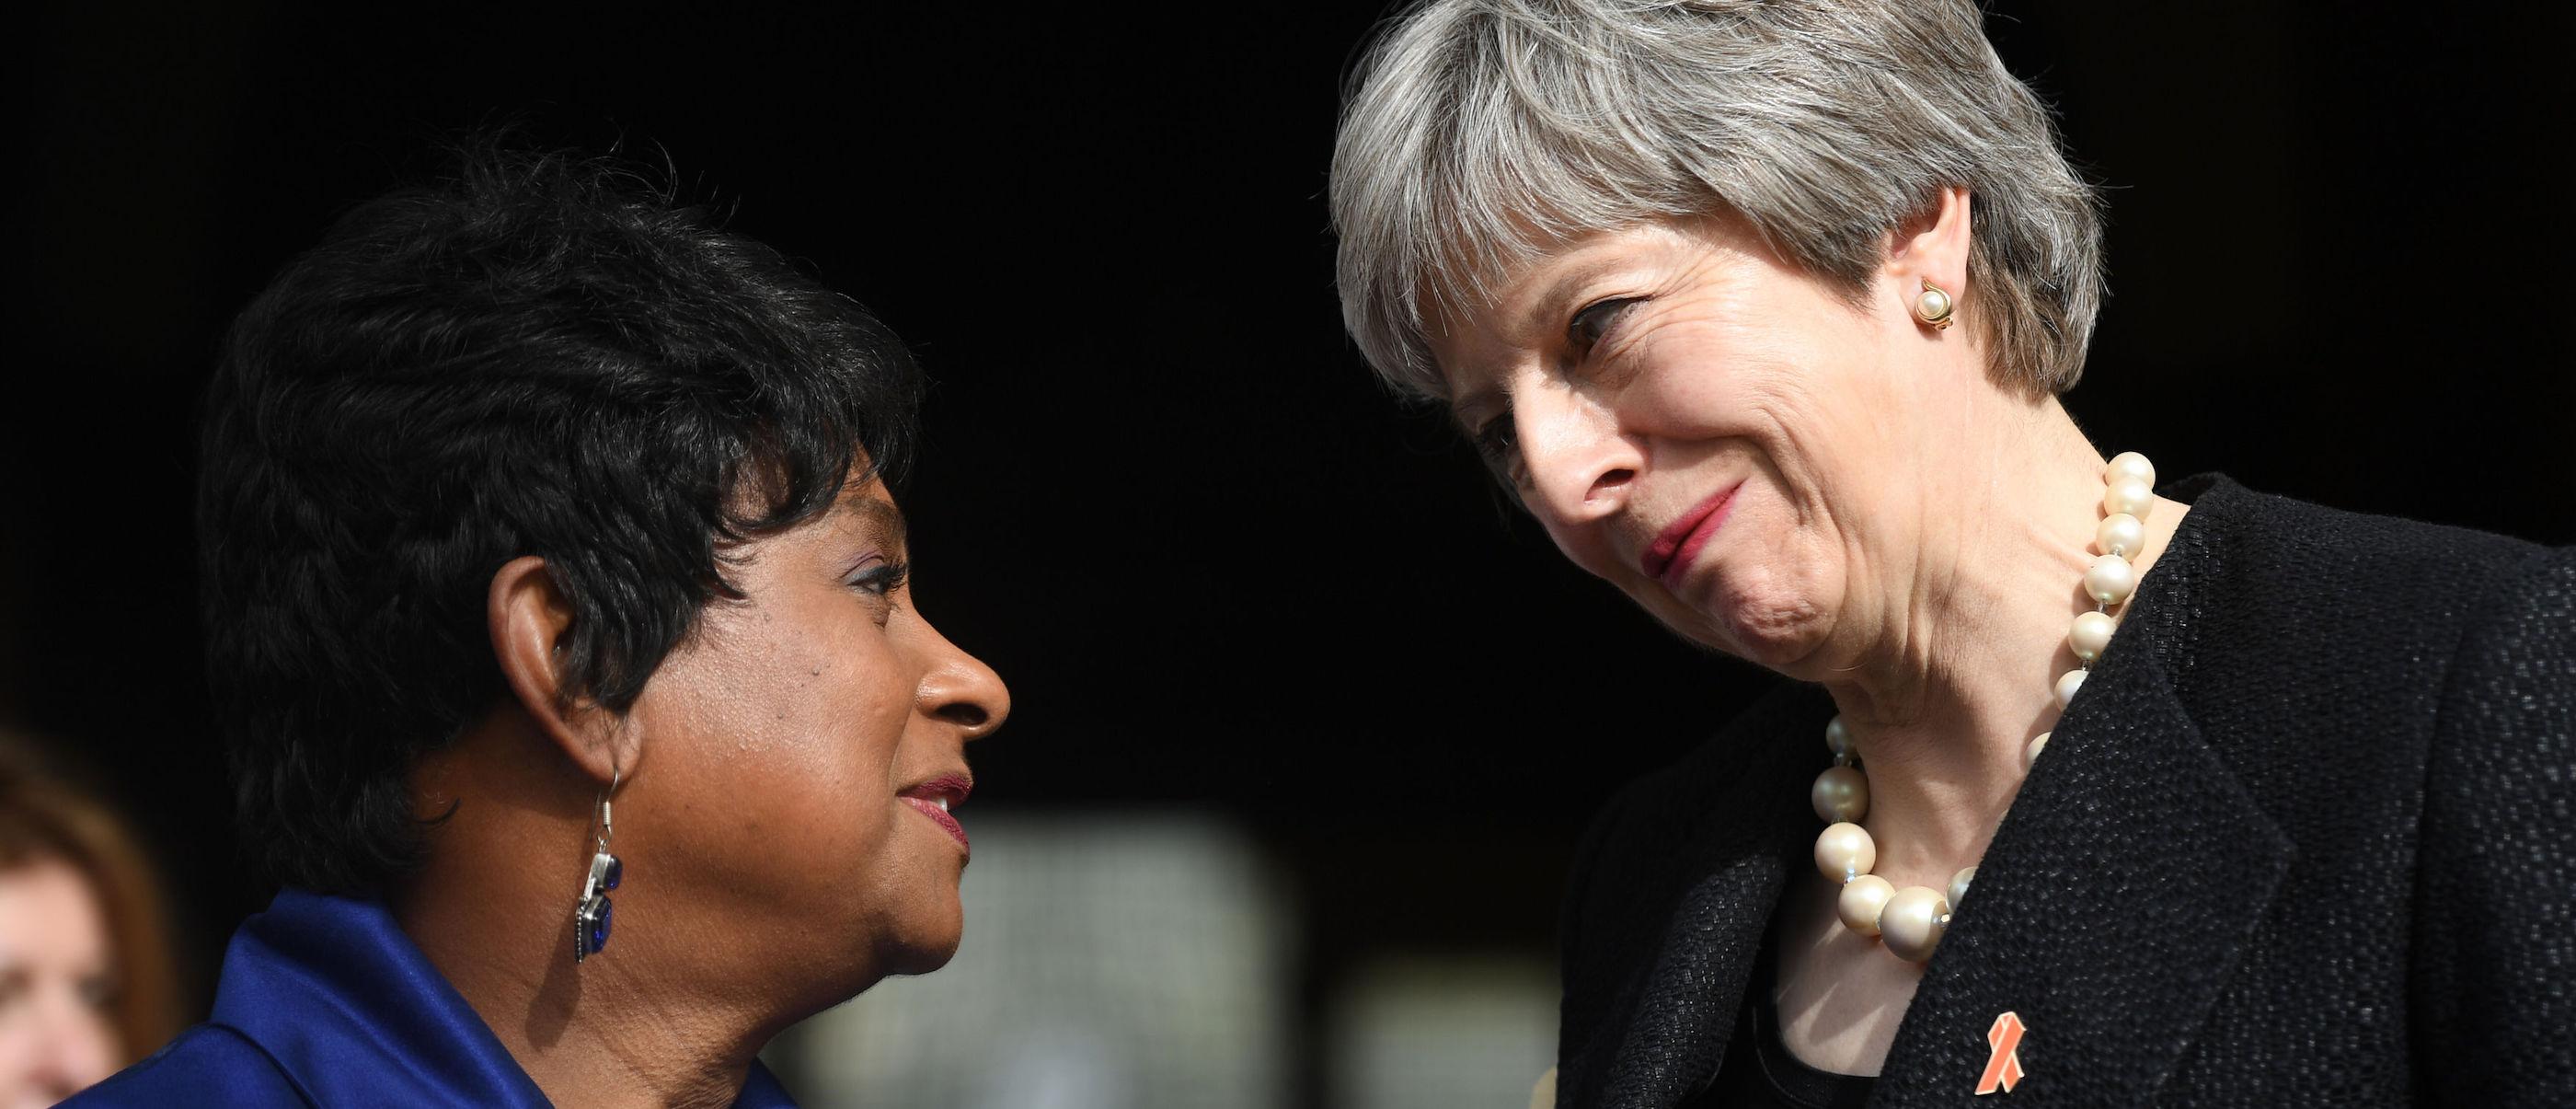 Baroness Lawrence and Theresa May